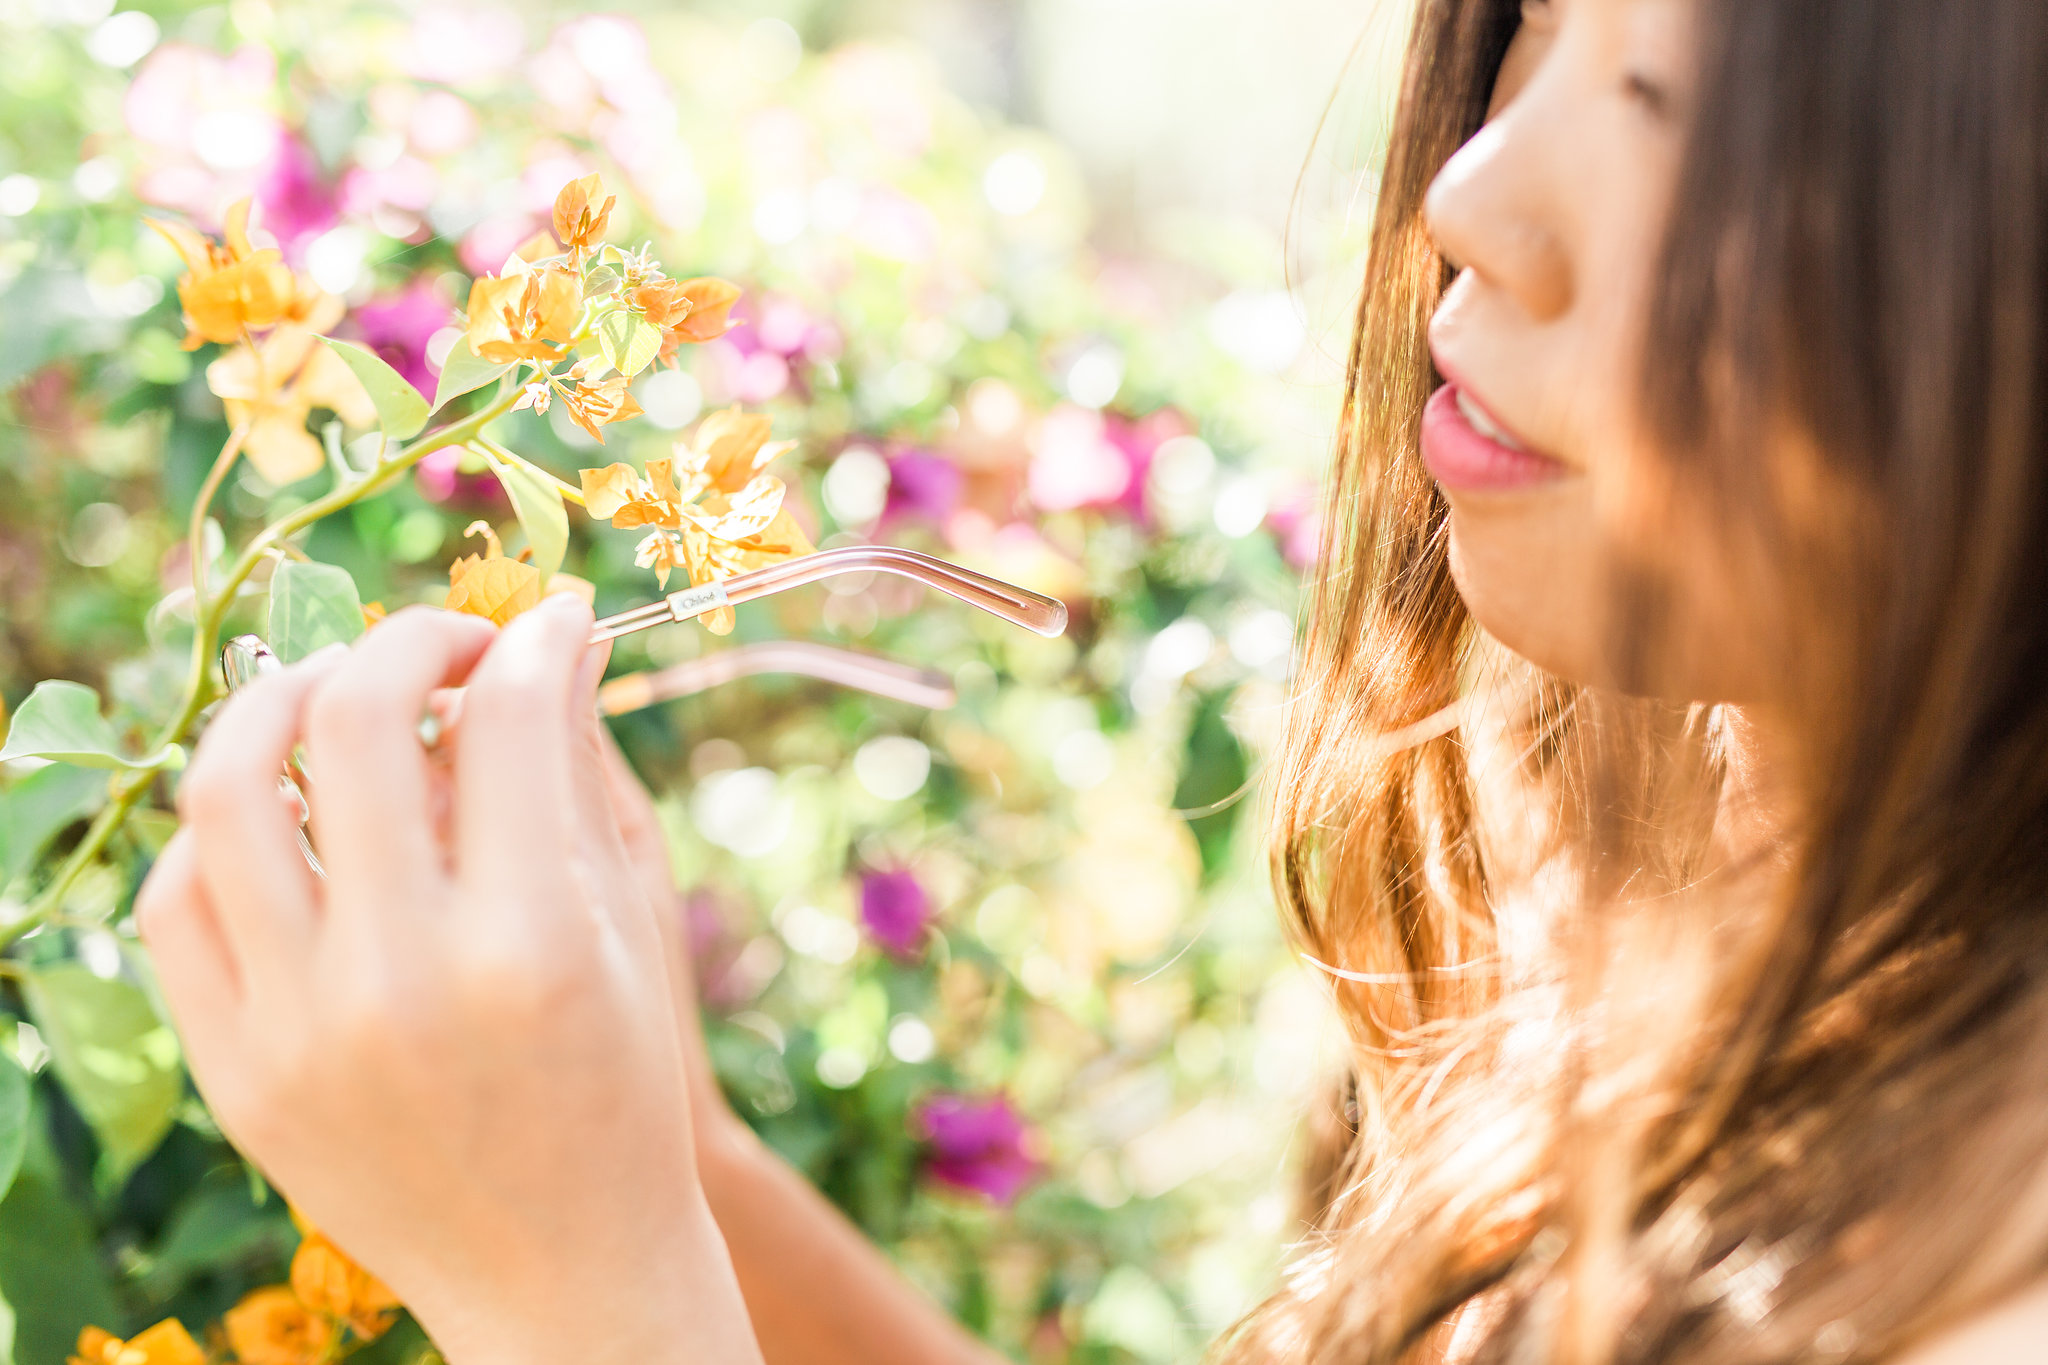 Best Spring Women's Fashion Prescription Eye Glasses Eyeconic Joyfullygreen Chloe Aviators 23.jpg